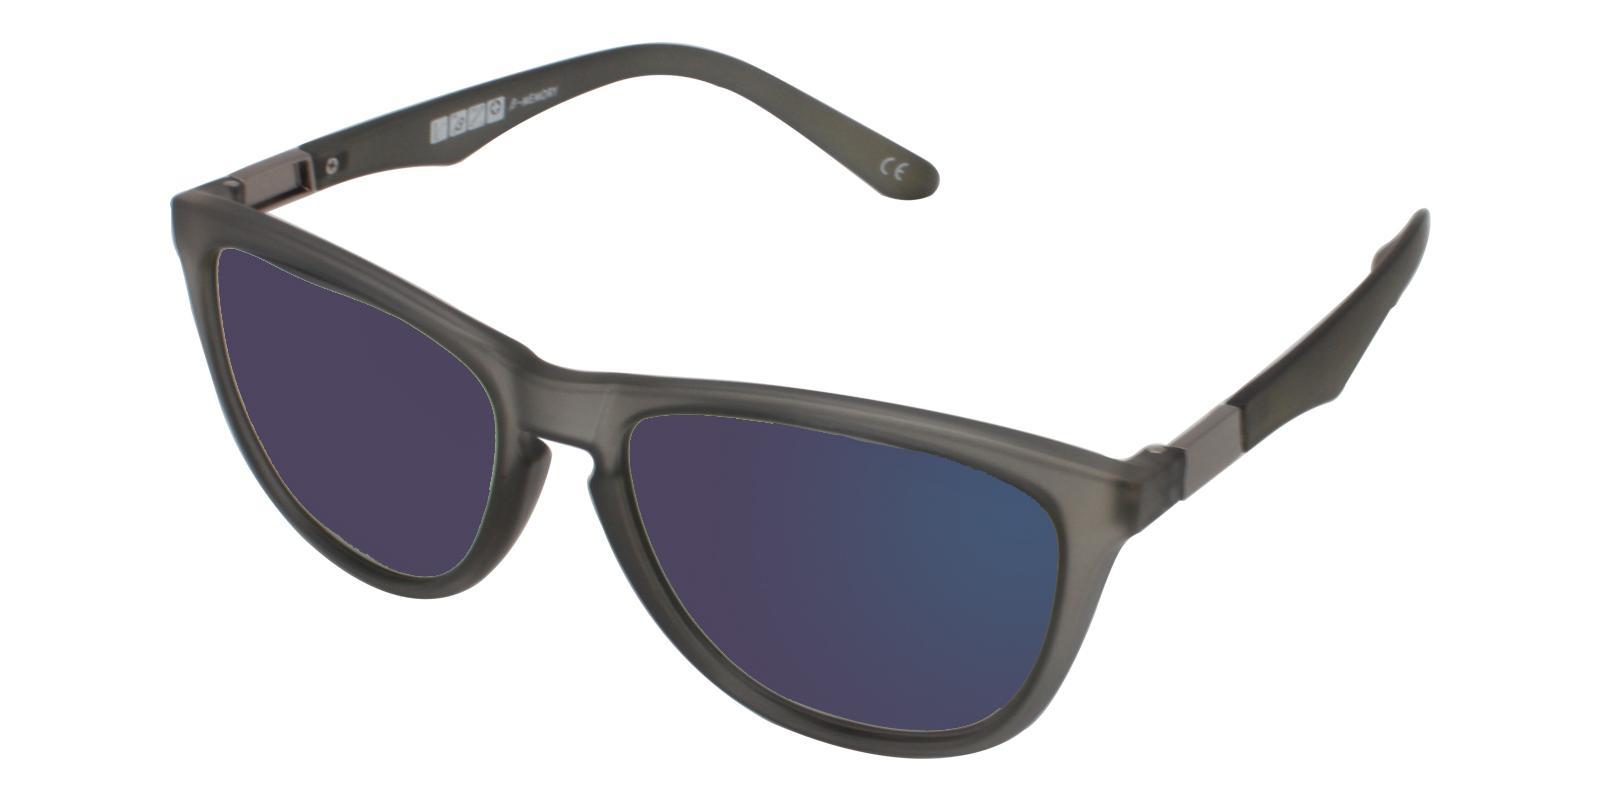 Bentleyville Gray TR Sunglasses , UniversalBridgeFit Frames from ABBE Glasses